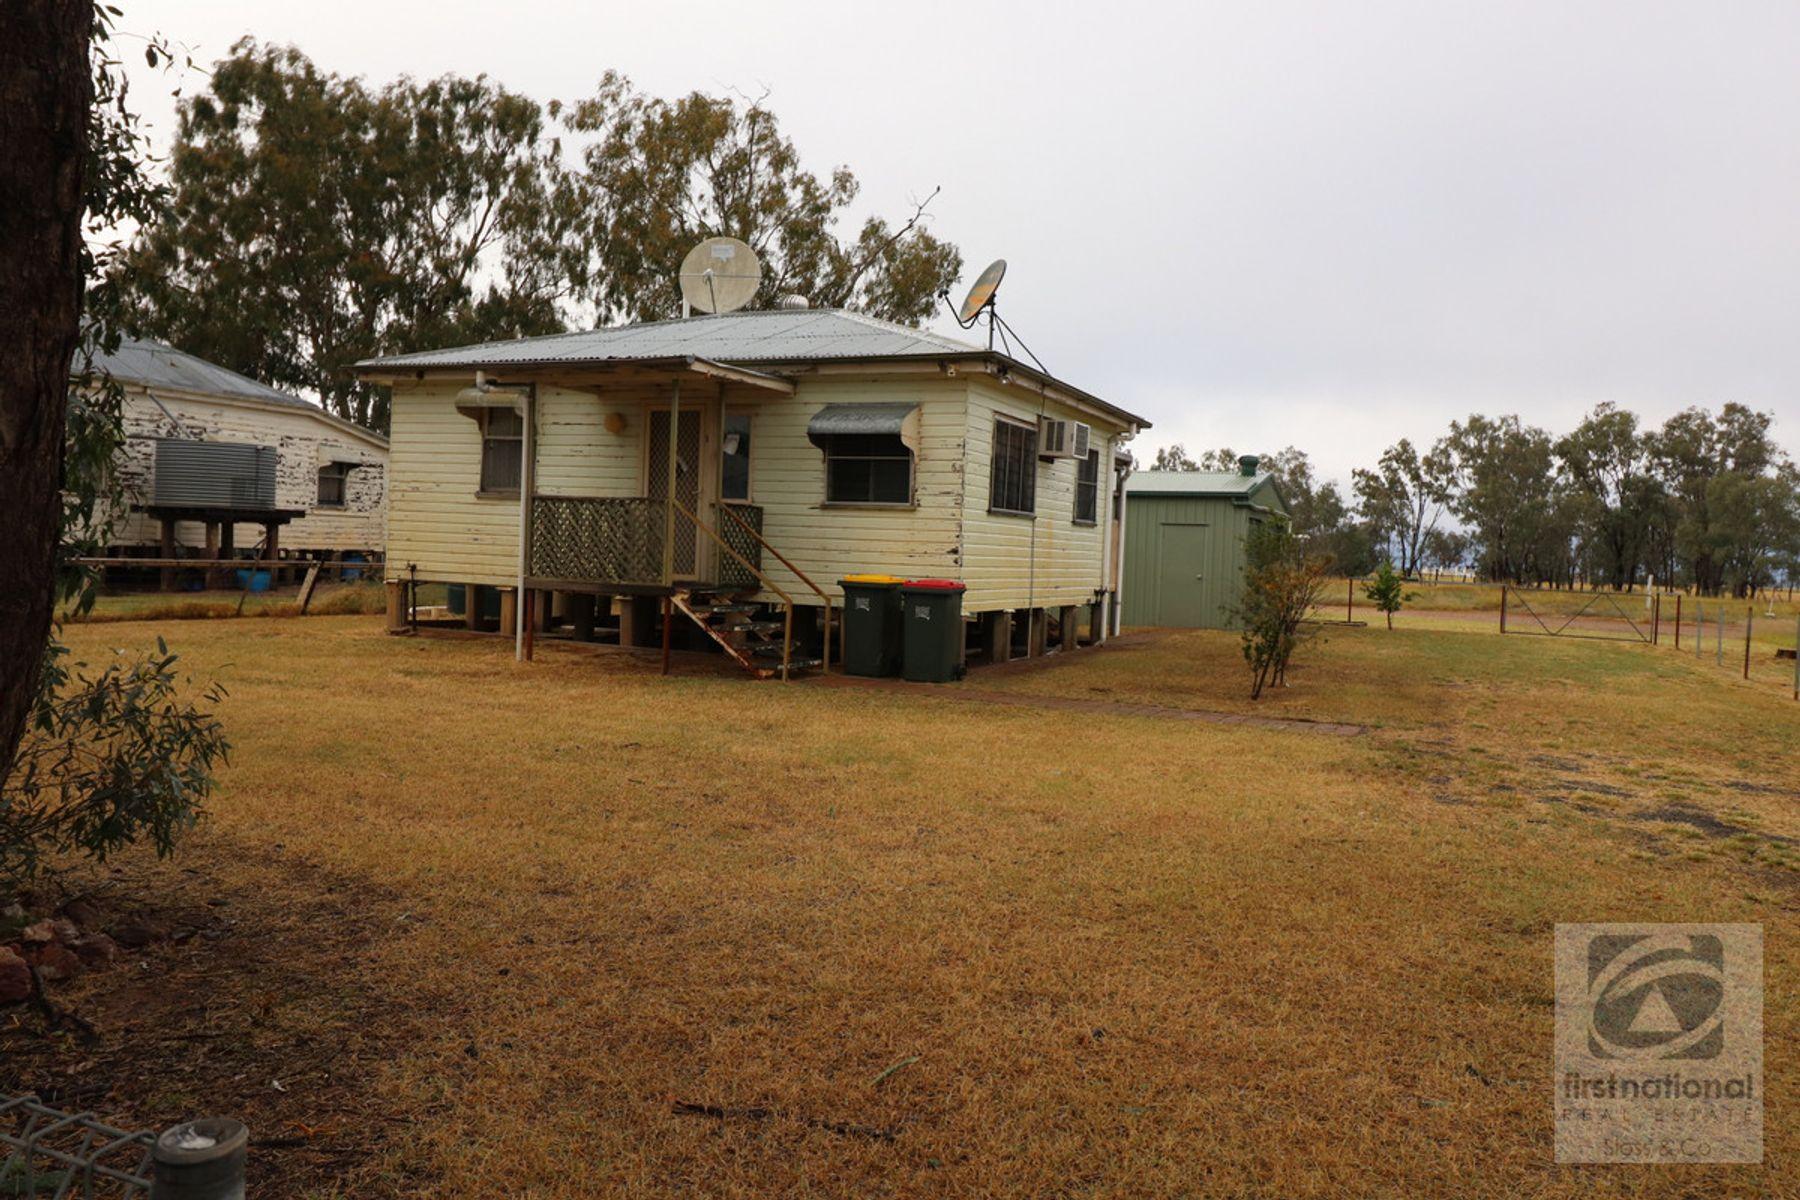 lot 5 Barwon Highway, Toobeah, QLD 4498